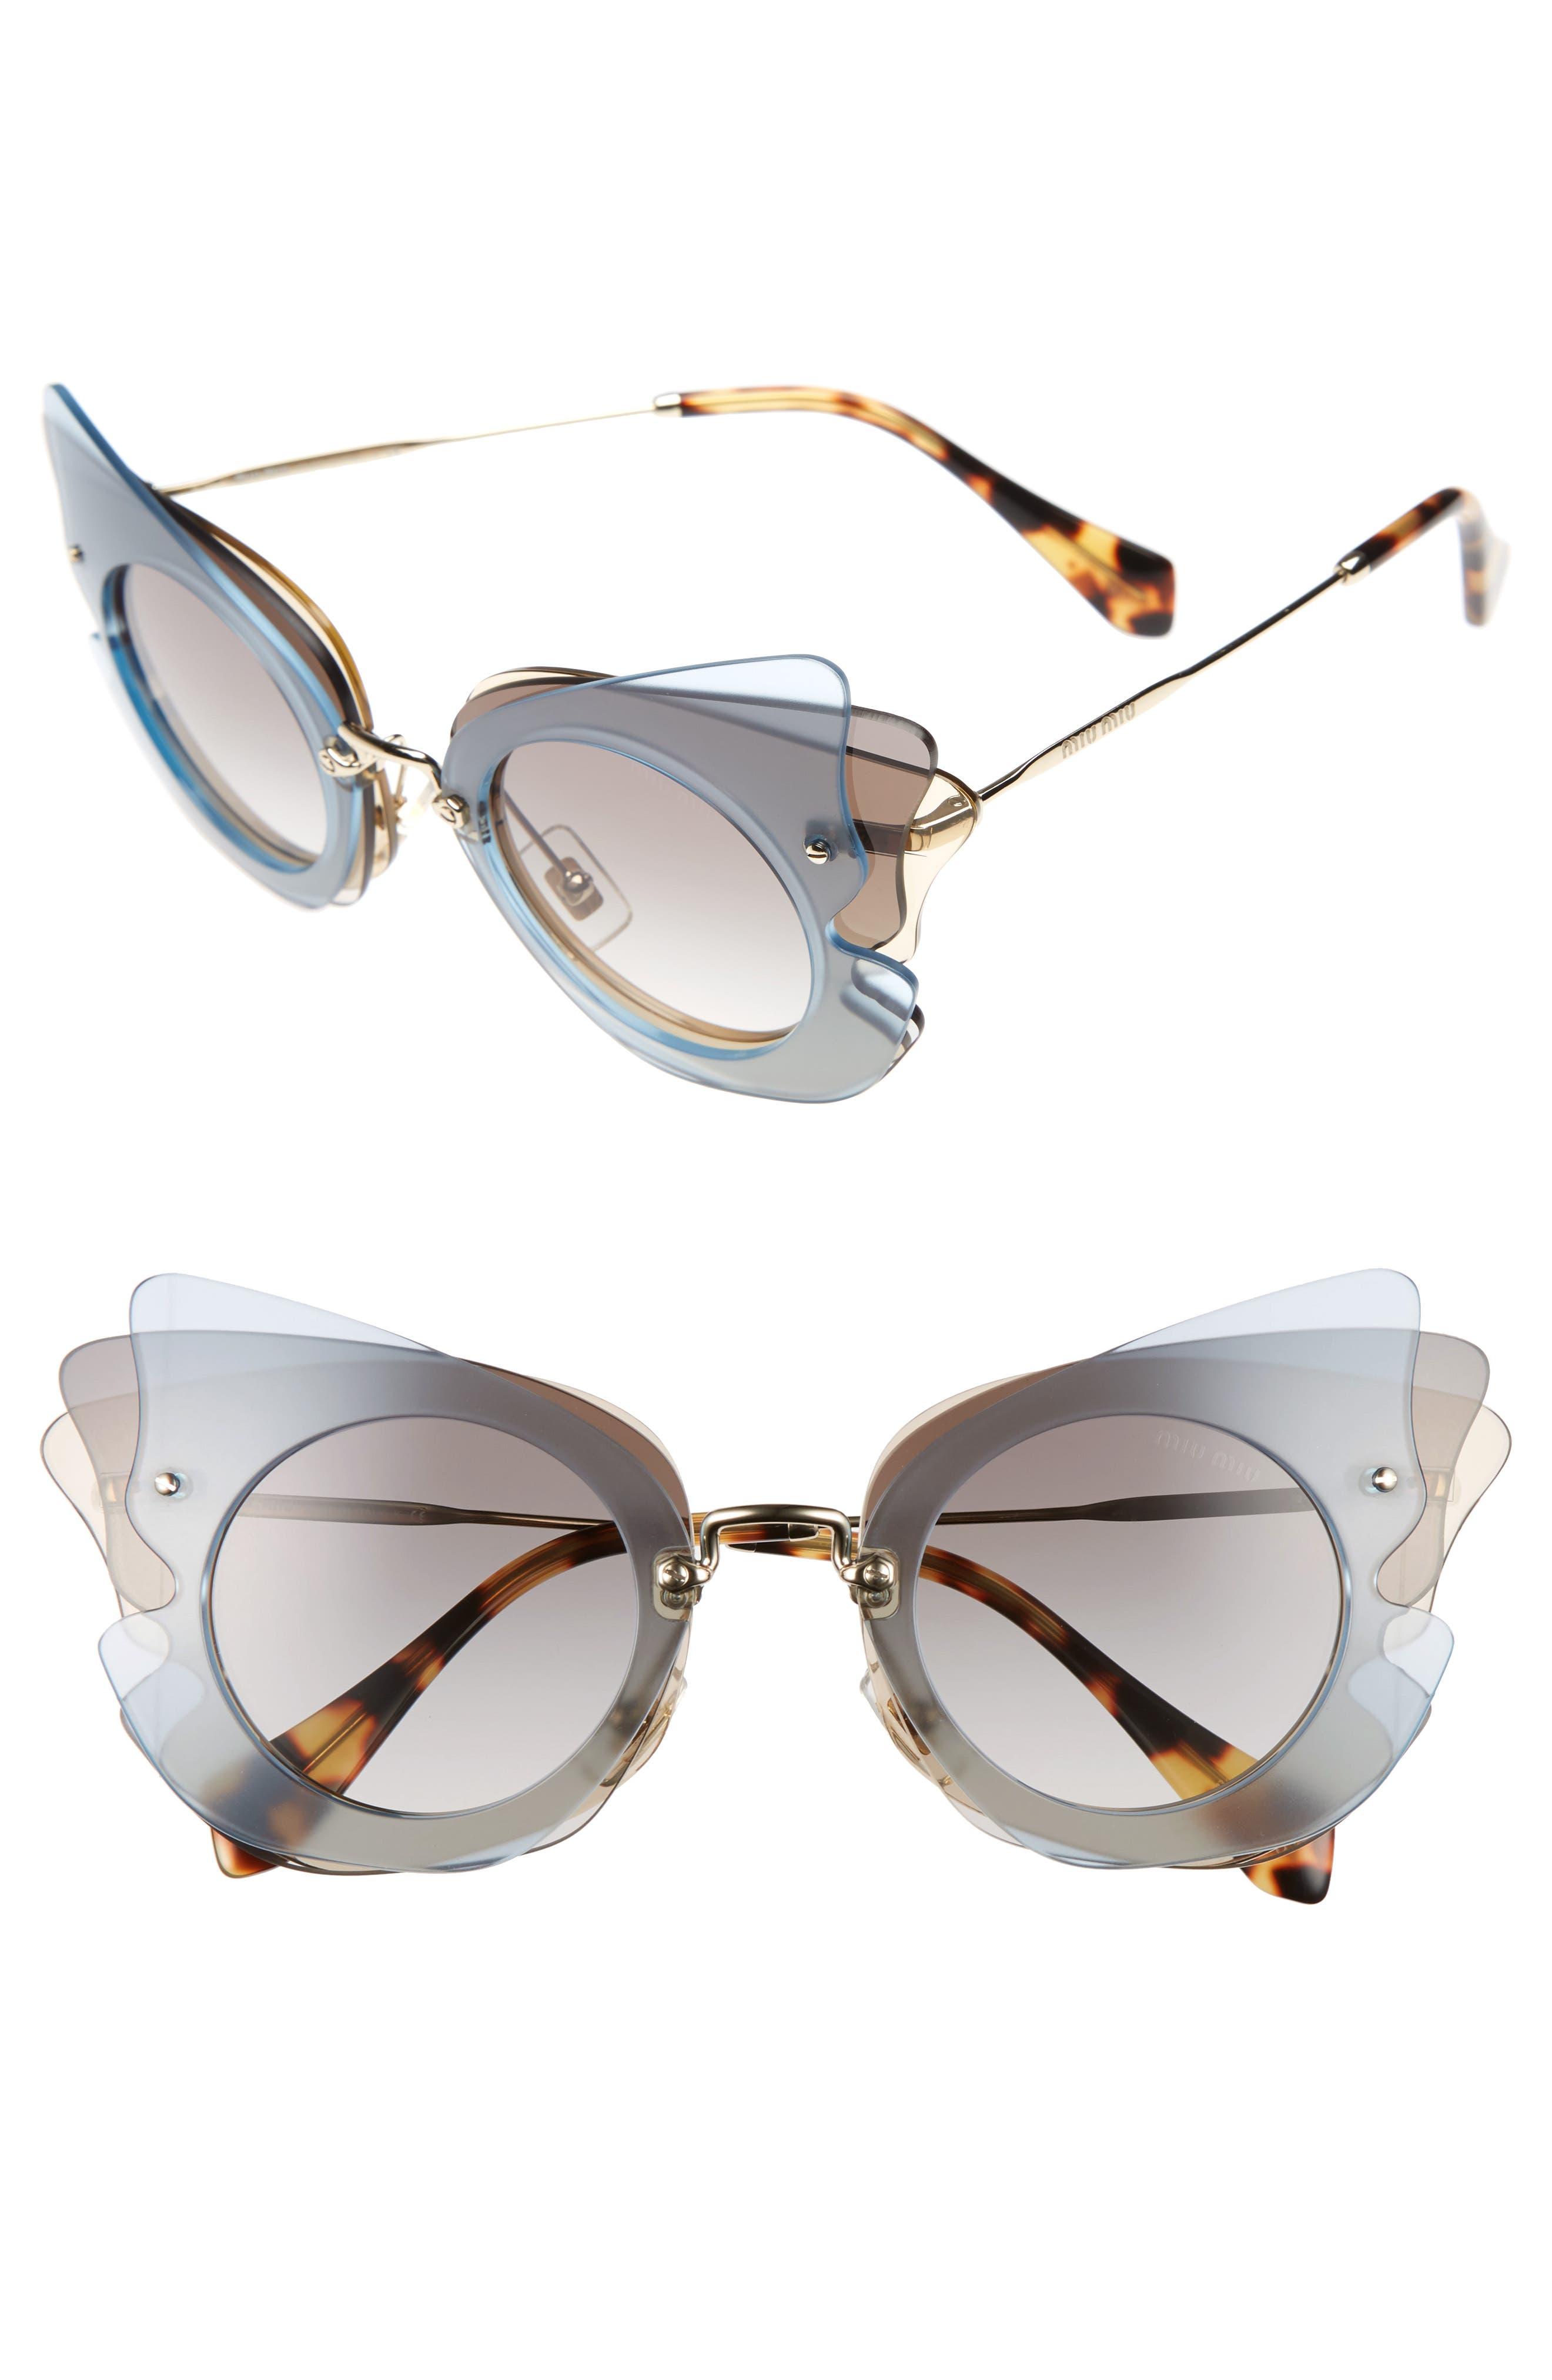 Main Image - Miu Miu 63mm Butterfly Sunglasses